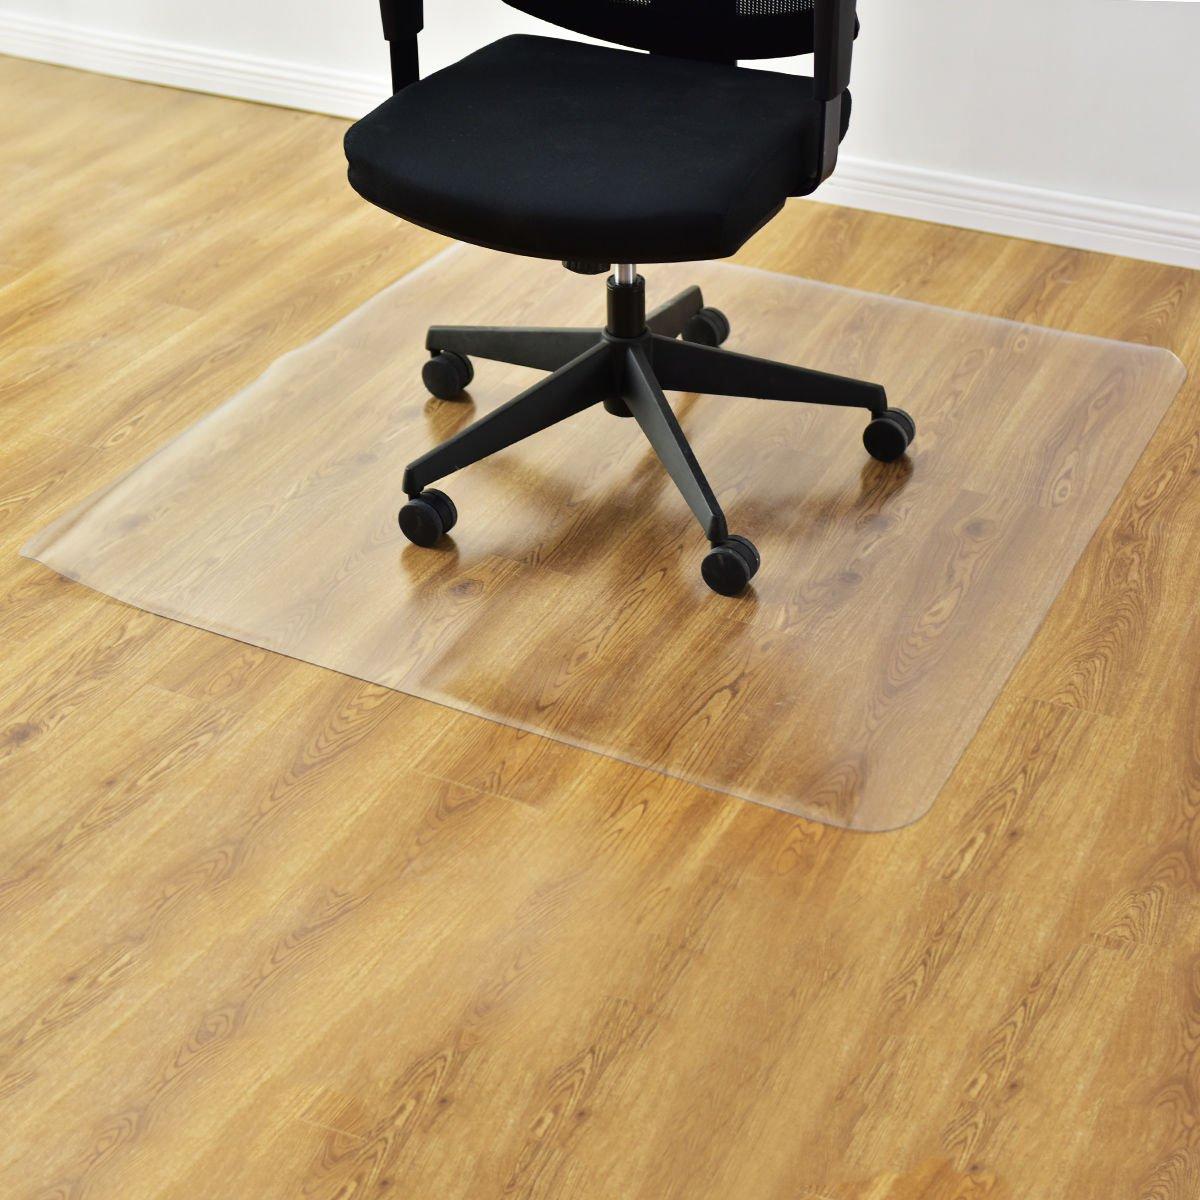 Azadx PVC Desk Chair Mat, Dull Polish Chairmat Protection Floor Mat for Hard Floor Use,Multi-Purpose 0.15cm Floor Protector,Transparent (48'' X 59'' Mat)